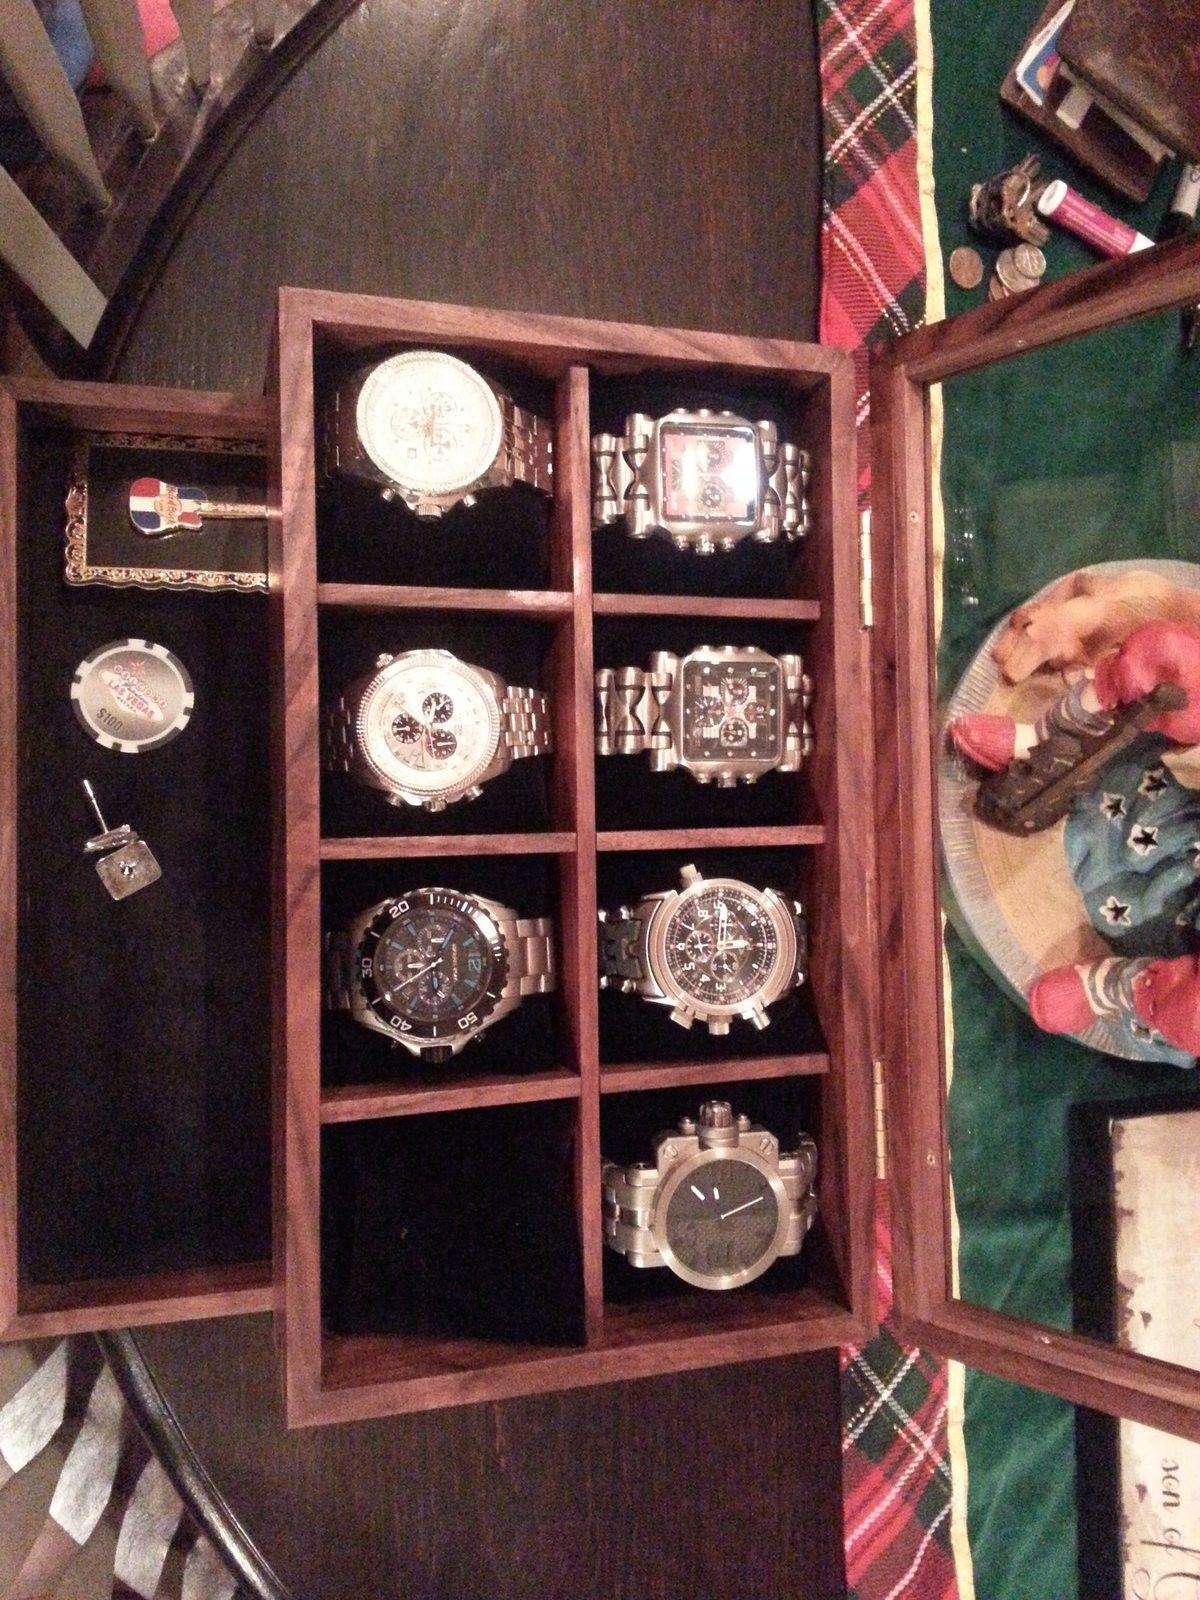 Got a new watch box.....collection growing - 20151201_203909.jpg